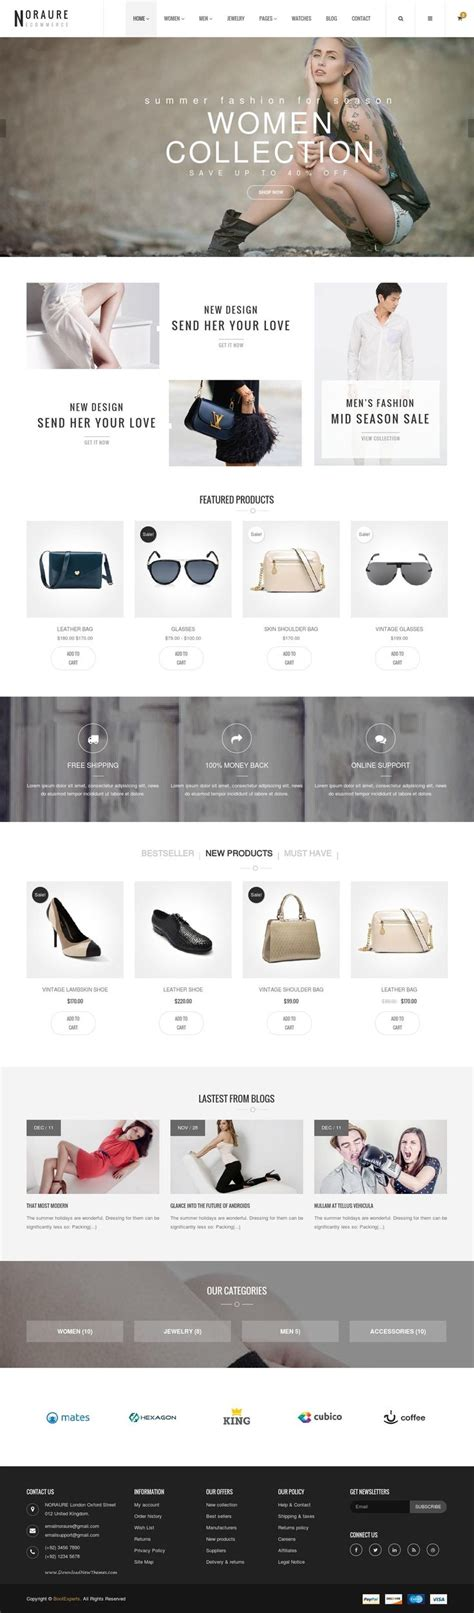 Noraure Mega Shop Bootstrap Template 웹디자인 및 영감 Mega Shop Template